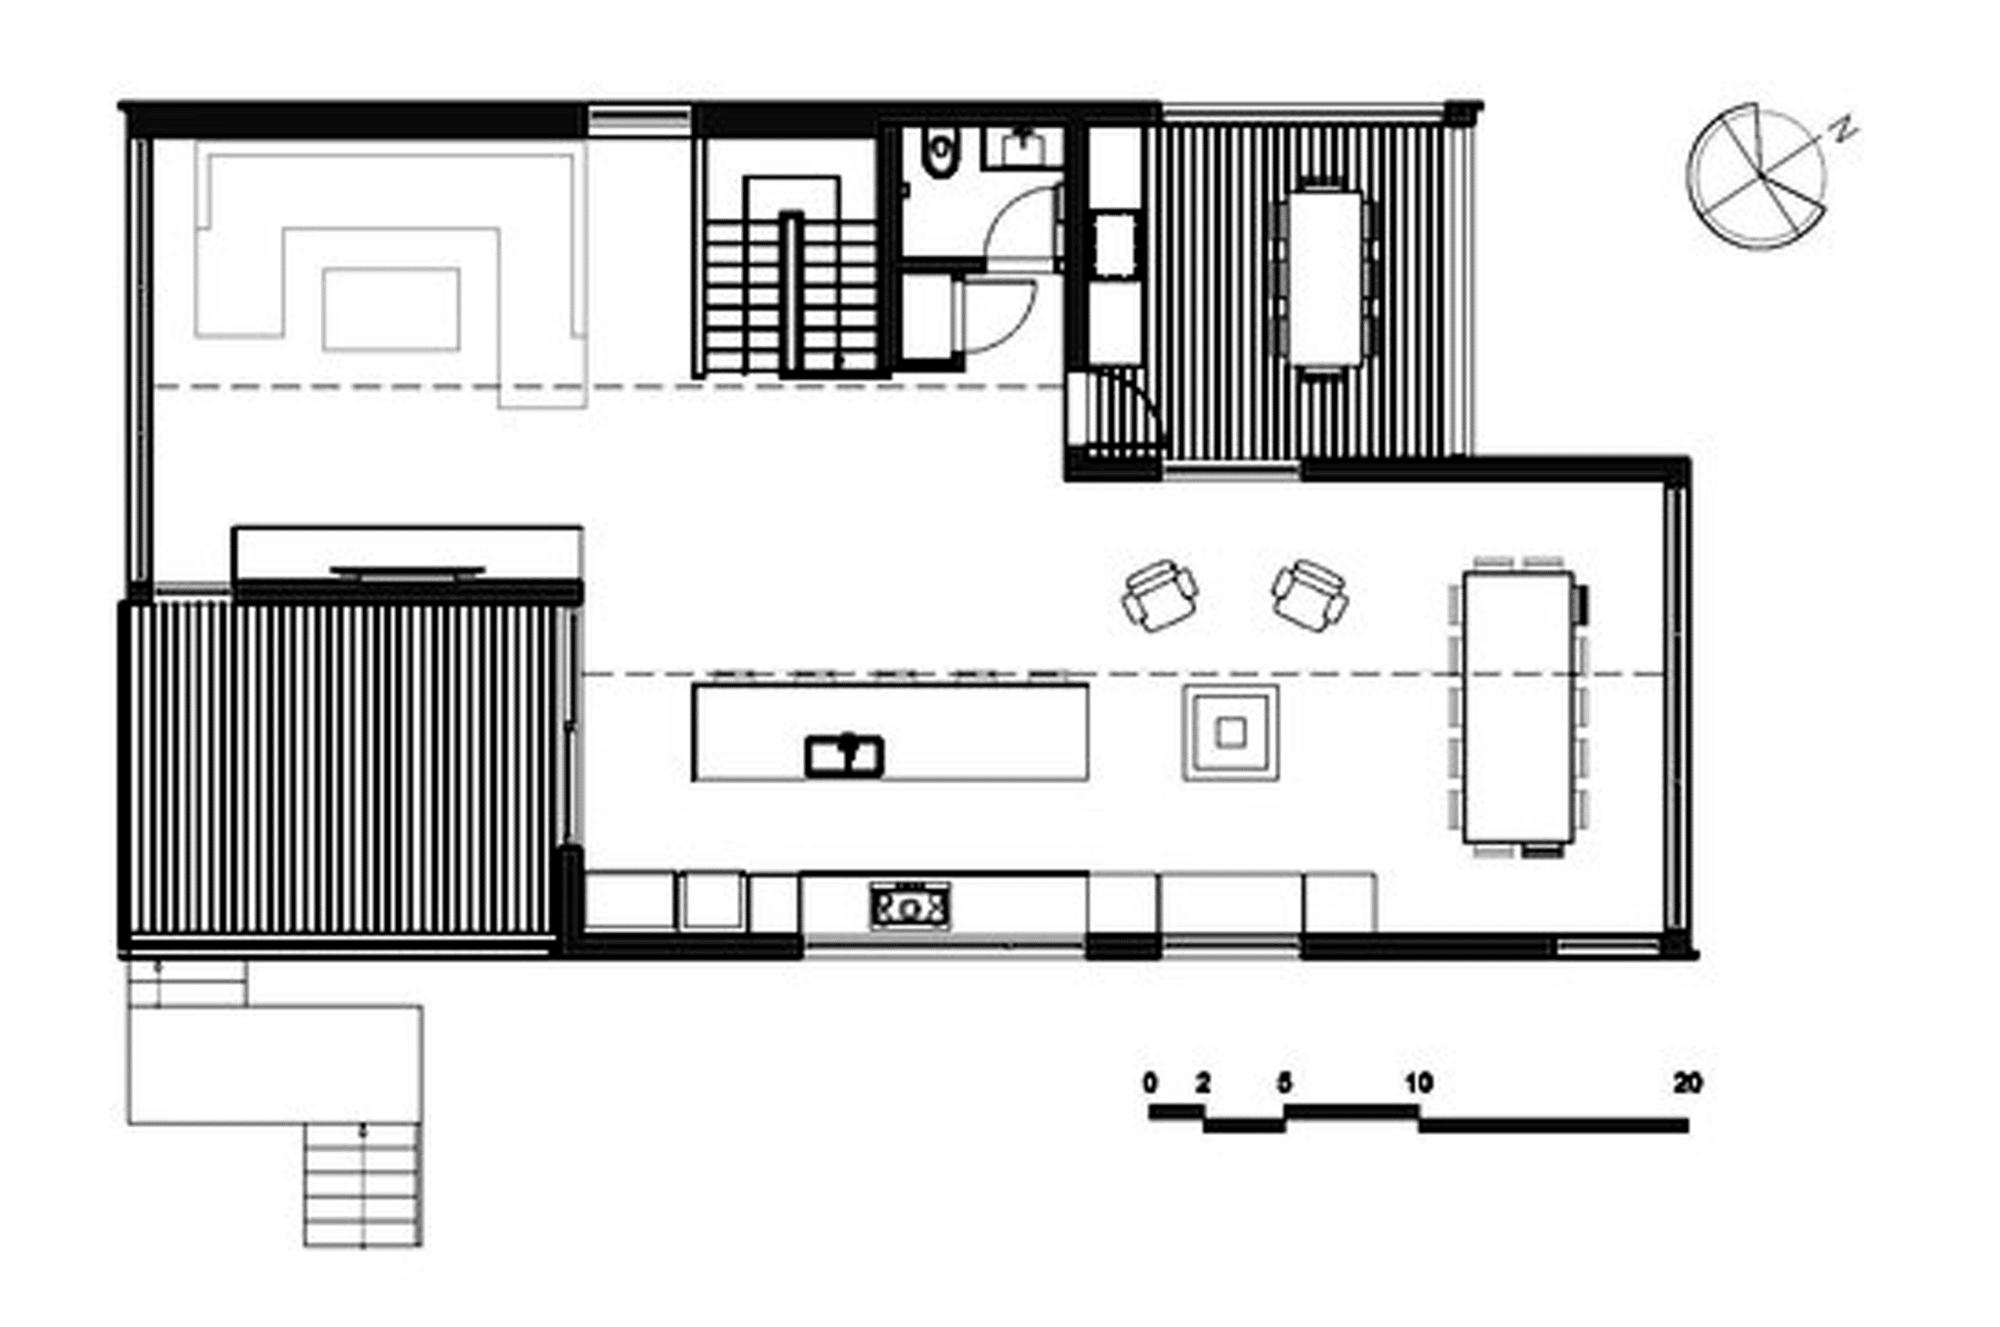 Dise o de casa moderna de dos pisos m s s tano planos for Planos para cocina mejorada